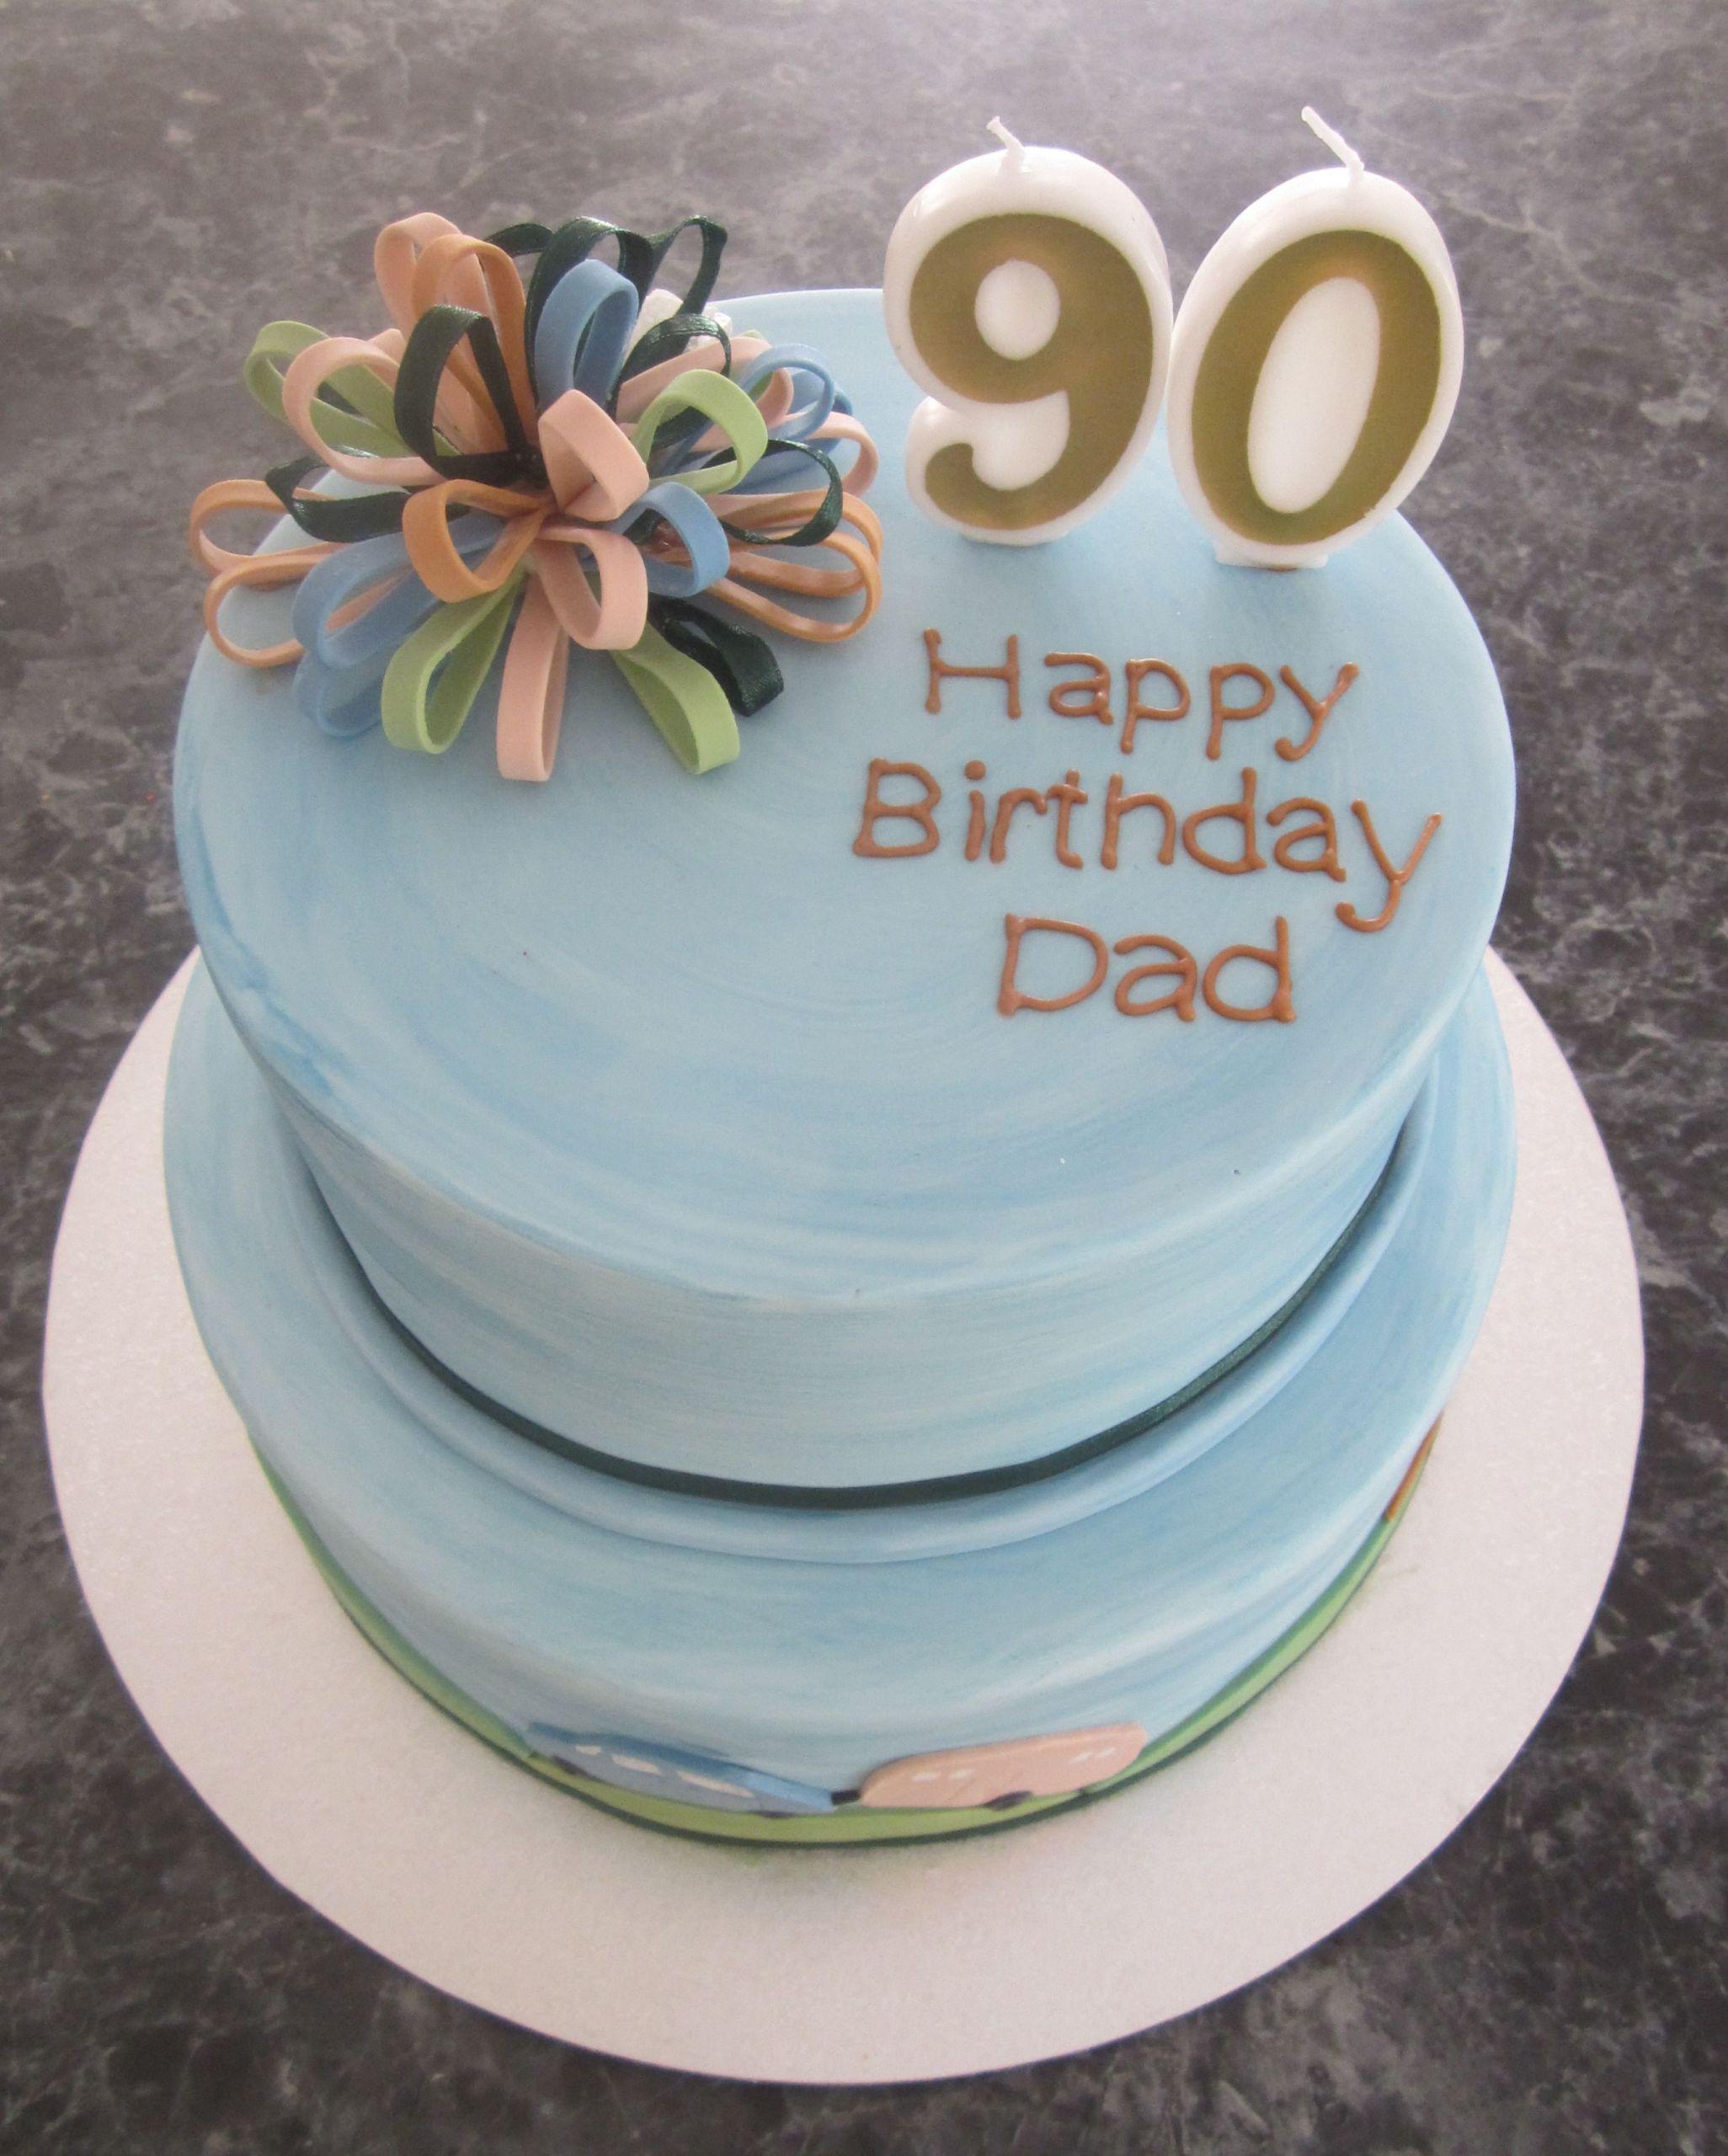 90Th Birthday Gift Ideas For Men  Image result for 90th birthday cake for men